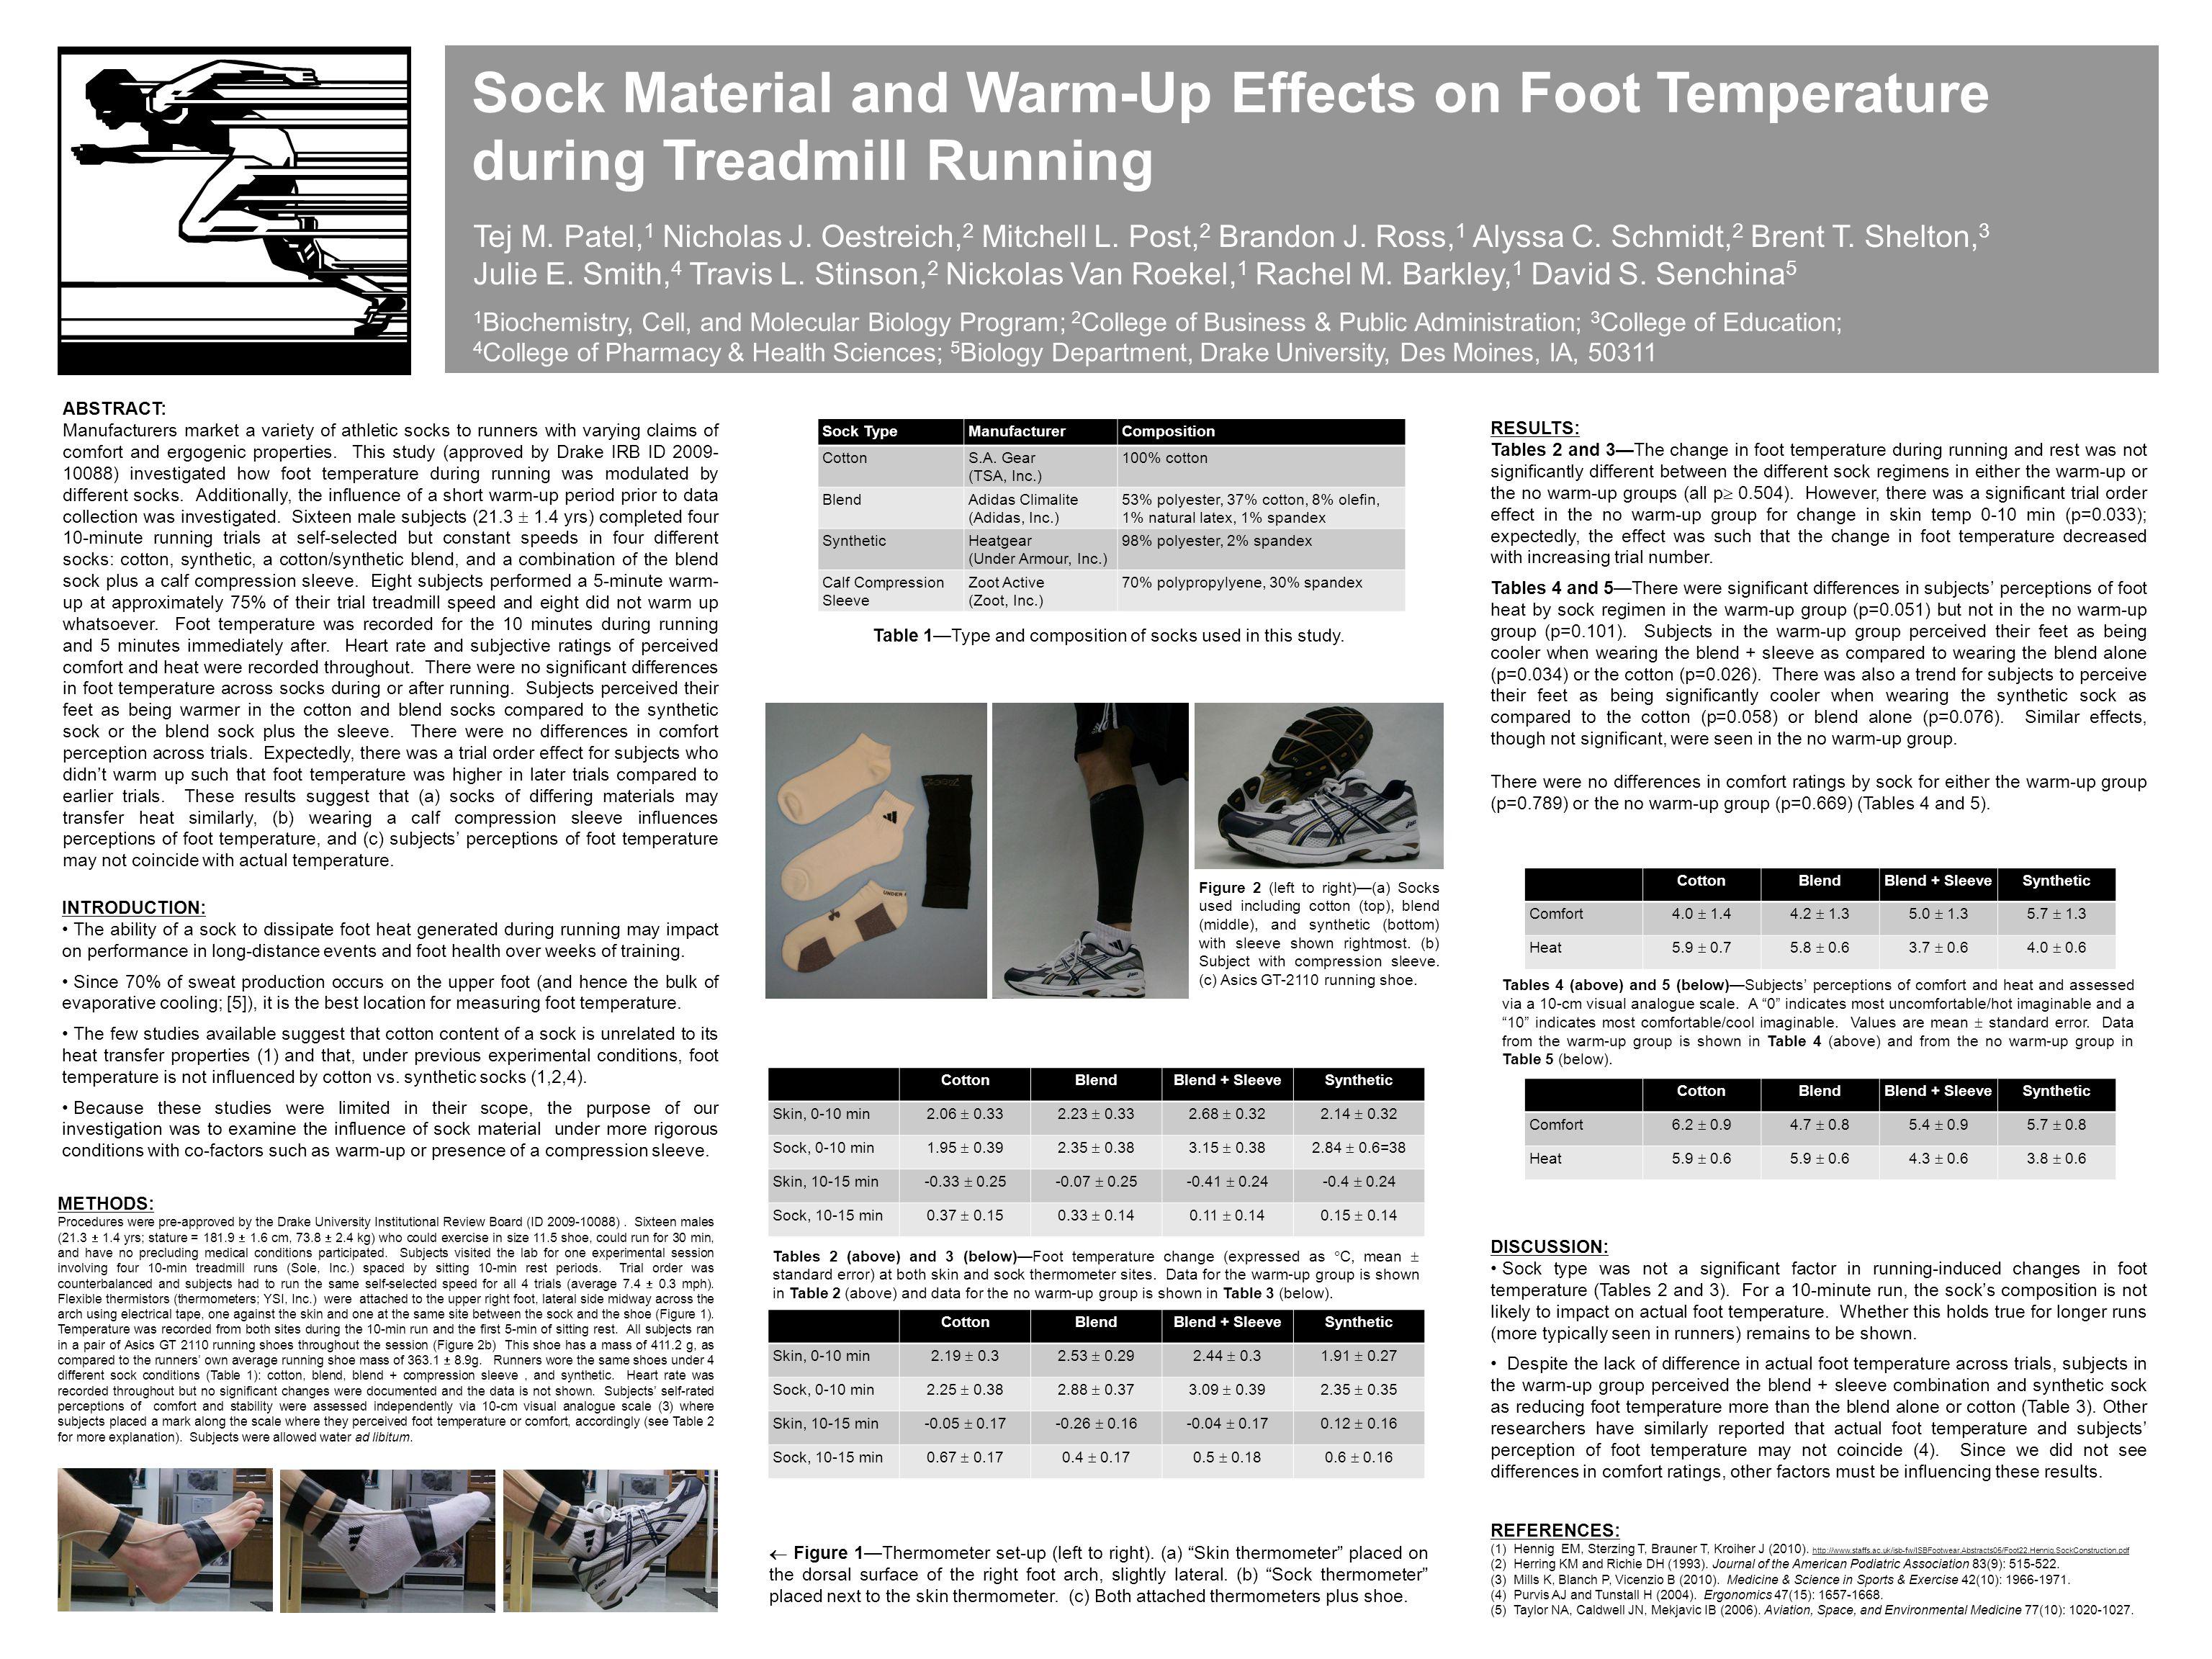 Sock Material and Warm-Up Effects on Foot Temperature during Treadmill Running Tej M. Patel, 1 Nicholas J. Oestreich, 2 Mitchell L. Post, 2 Brandon J.